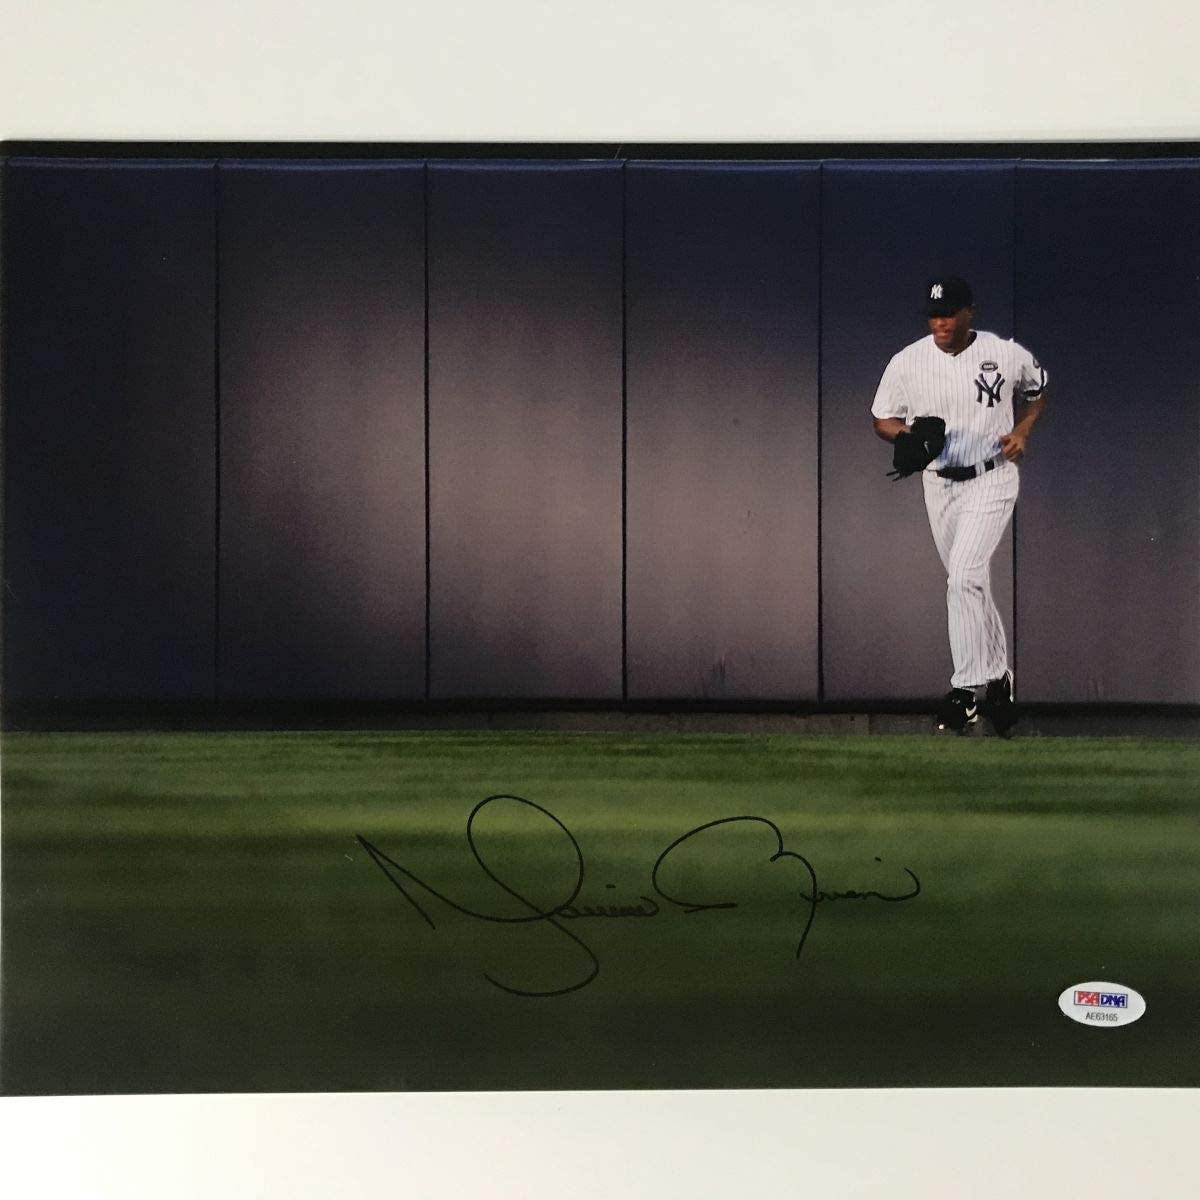 Autographed//Signed Mariano Rivera New York Yankees 11x14 Baseball Photo PSA//DNA COA Holo Only